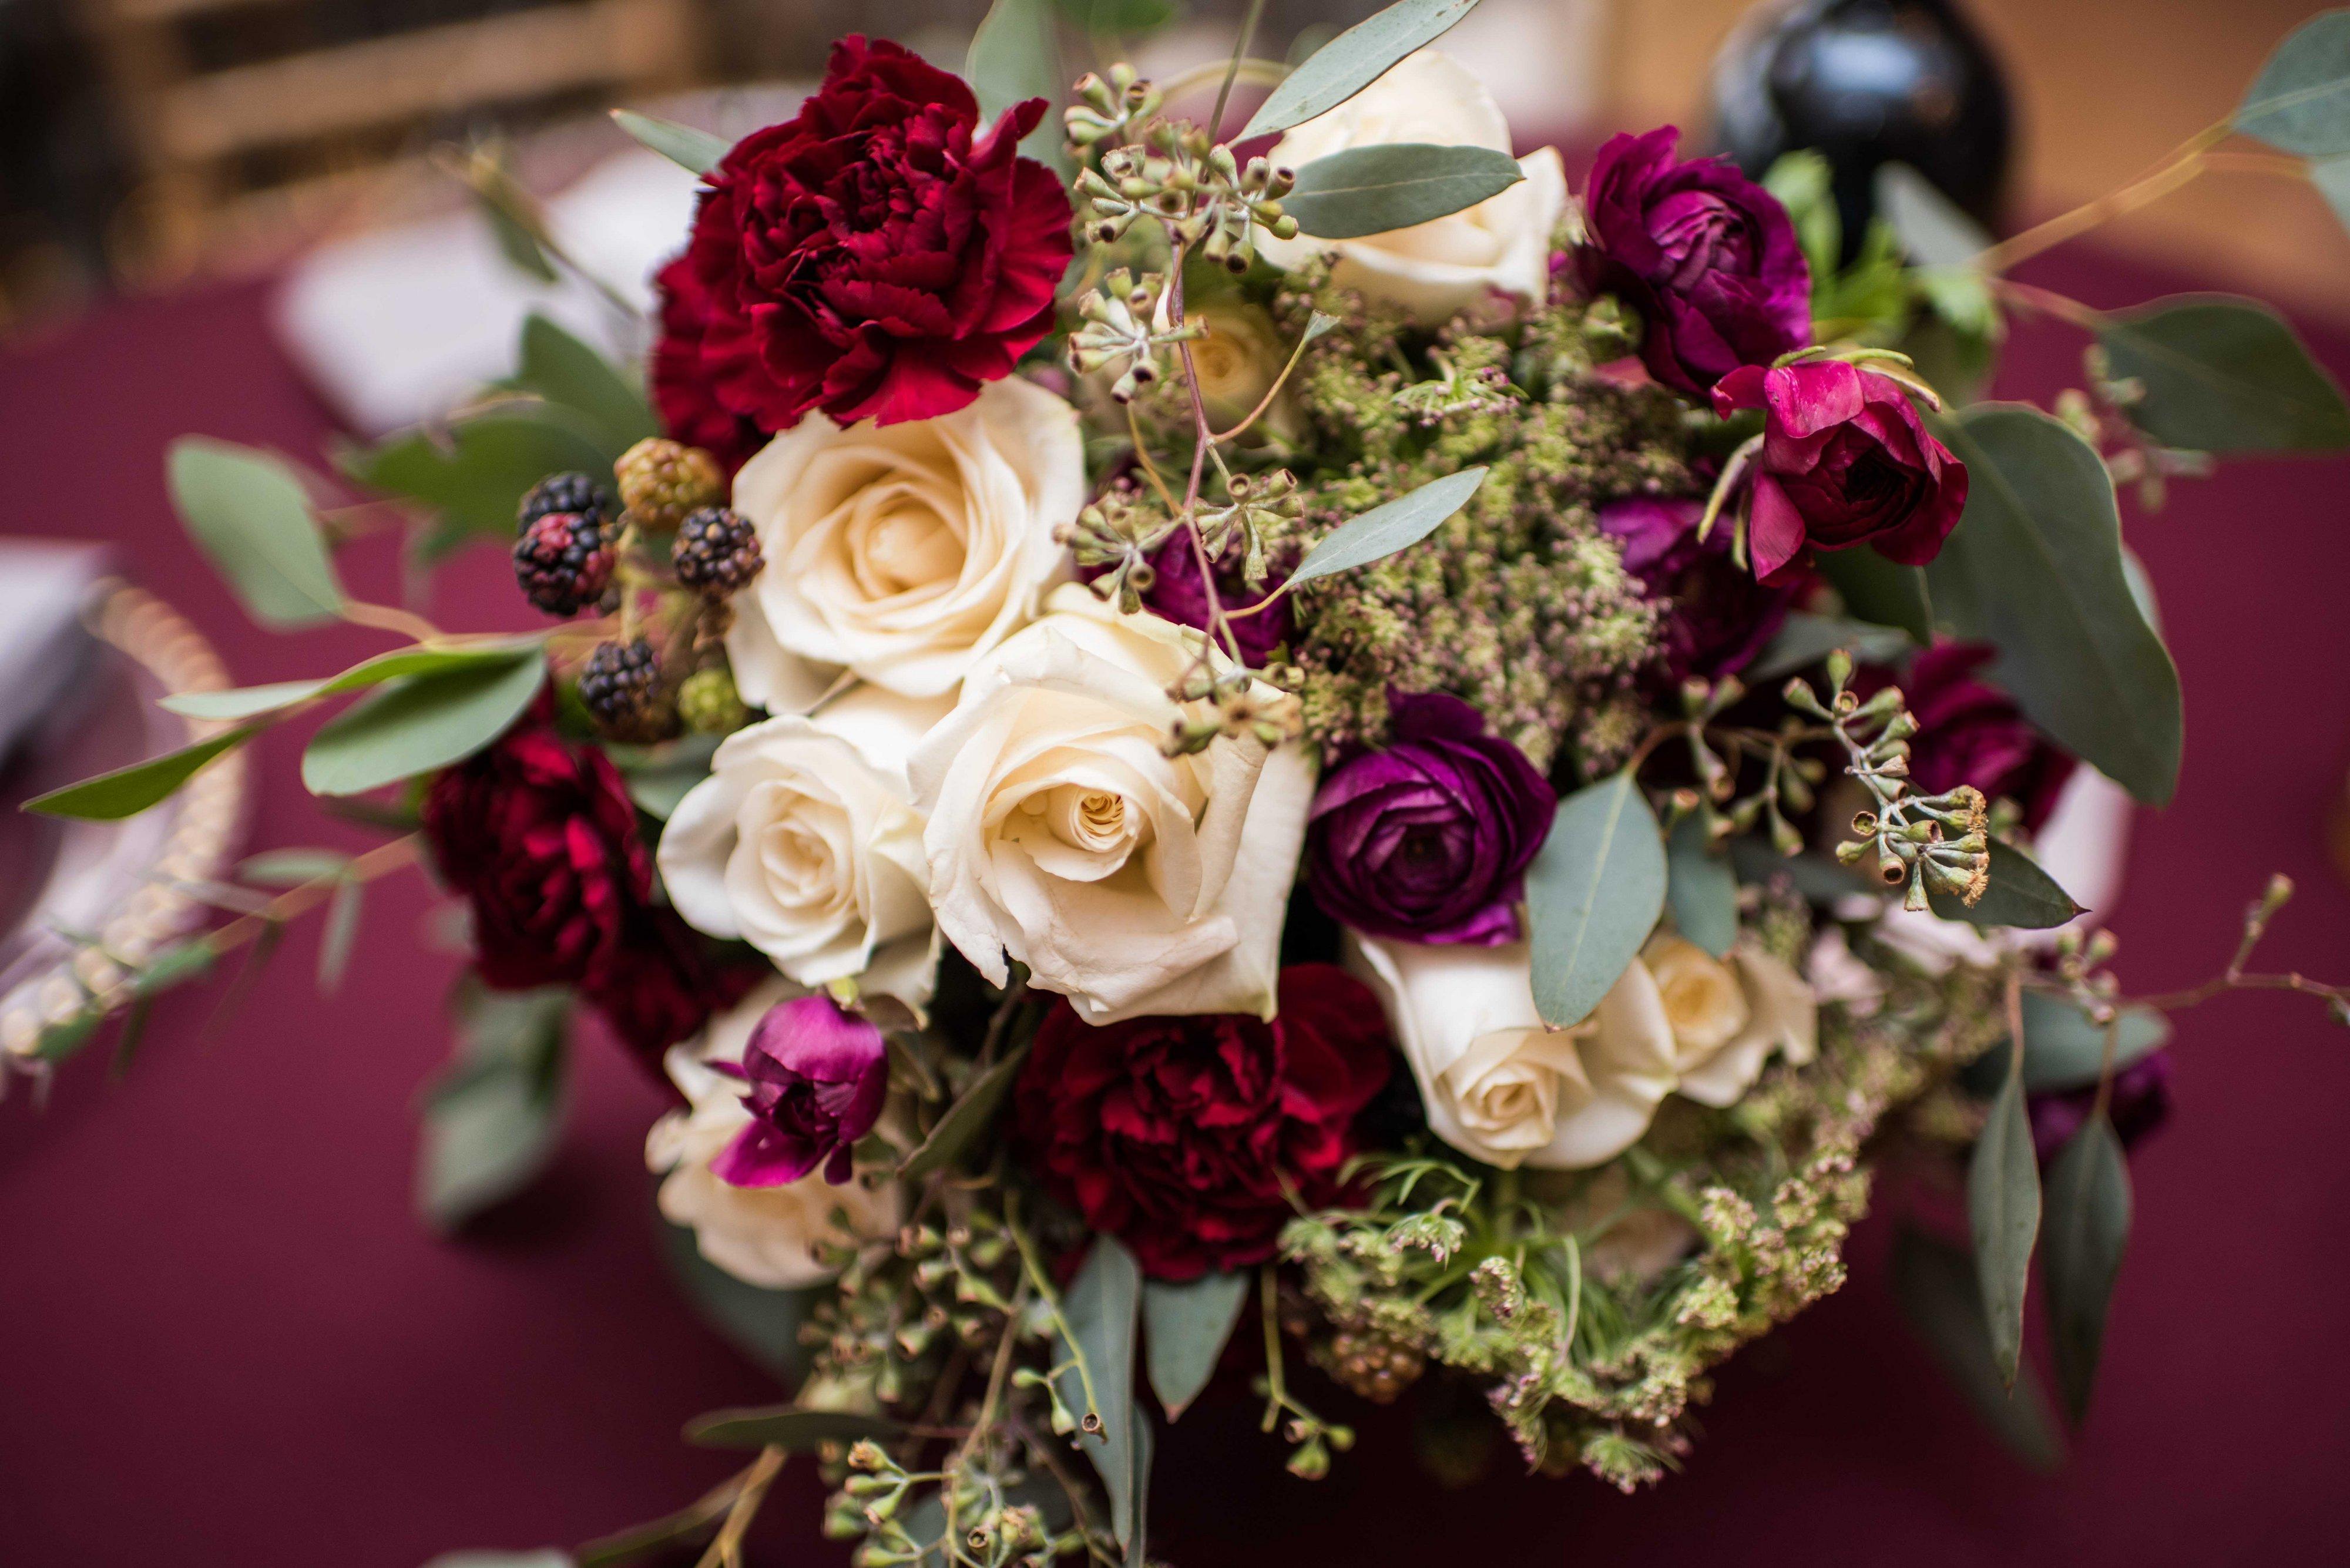 Bridal-Bouquet-Winter-Flowers-Wedding-Virginia-Beach-Lesner-Inn-Wandering-Petal.jpg